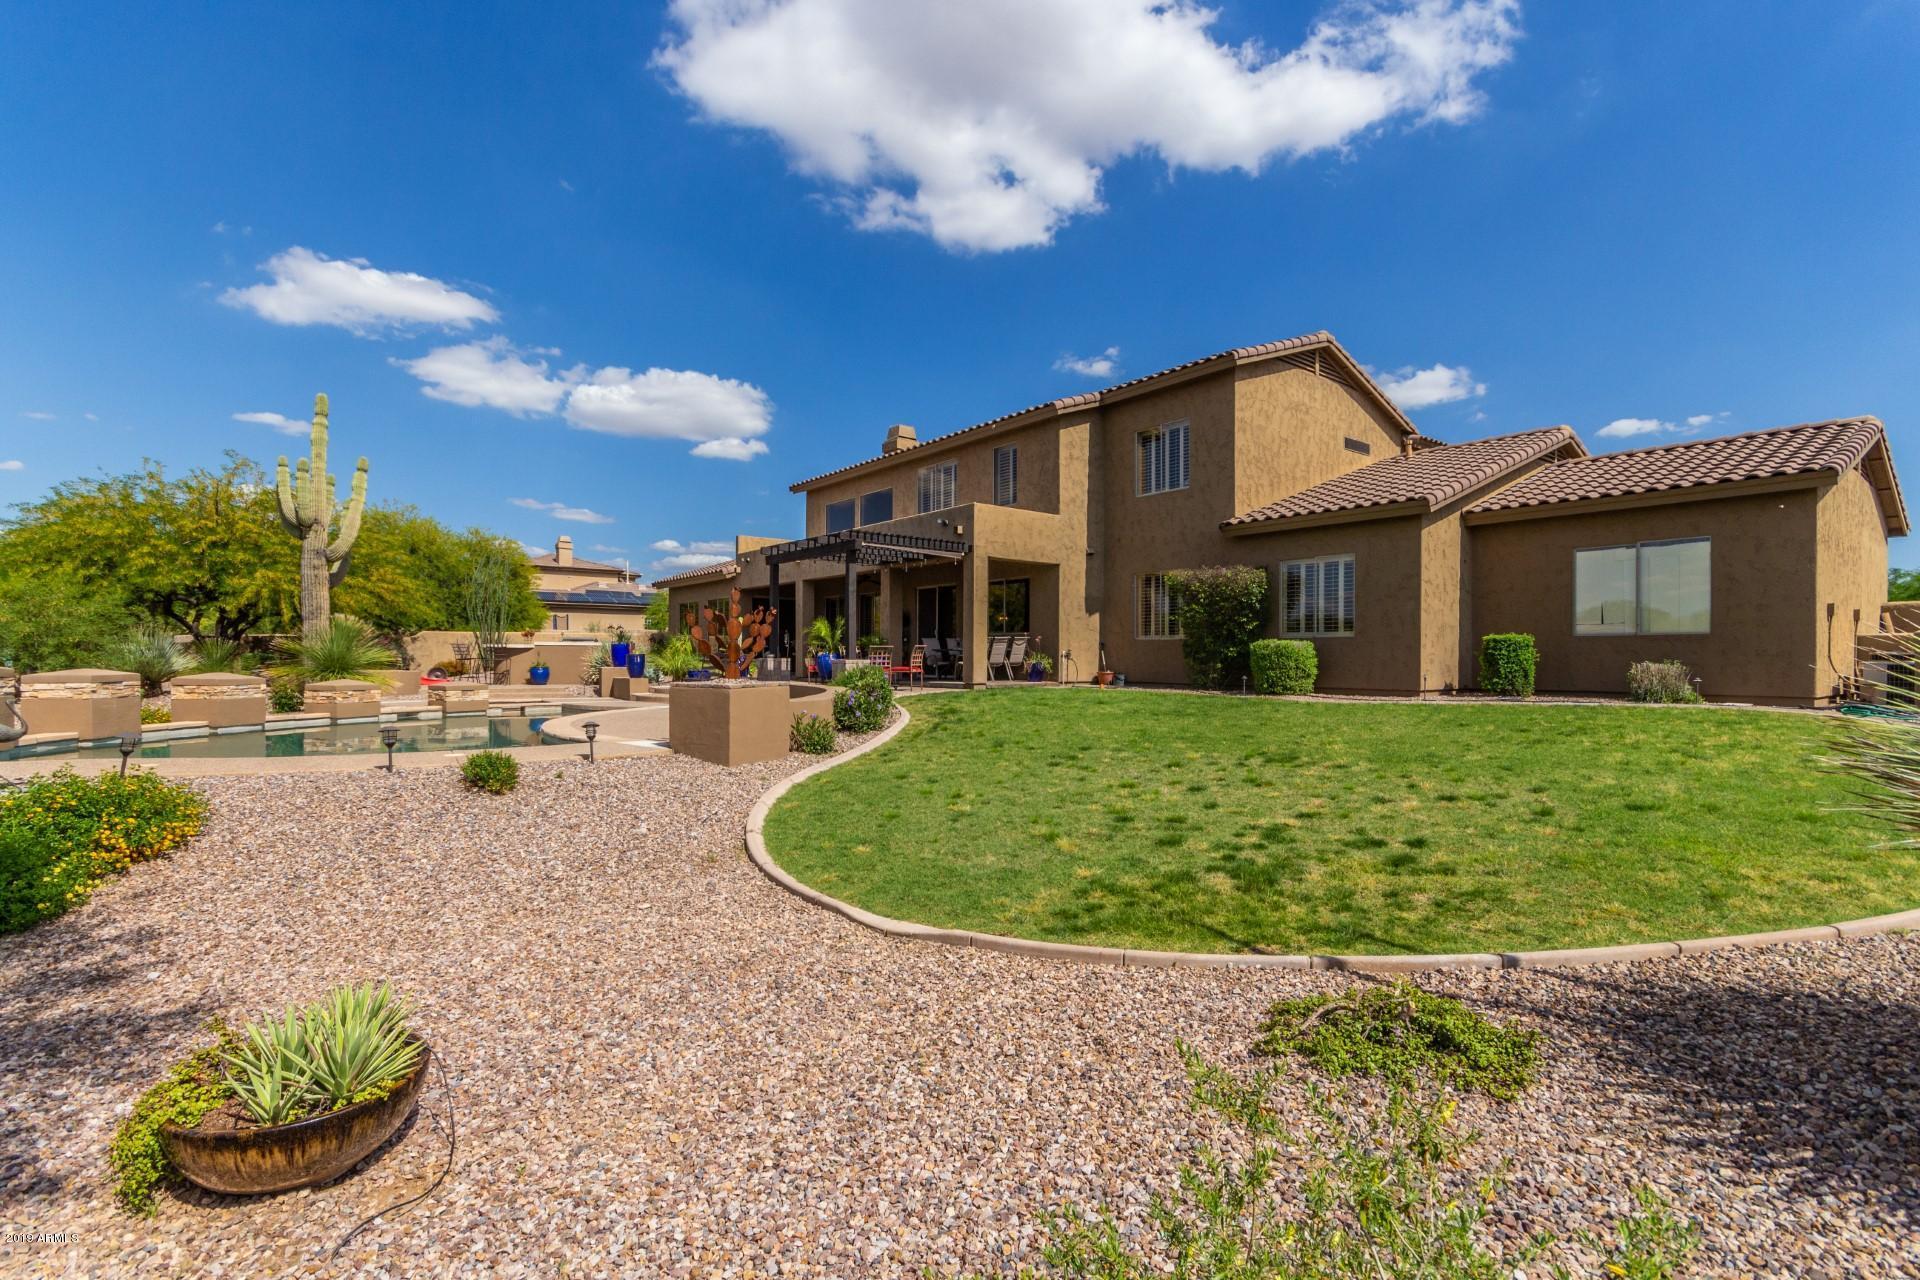 MLS 5919271 5868 E BENT TREE Drive, Scottsdale, AZ 85266 Scottsdale AZ Private Pool